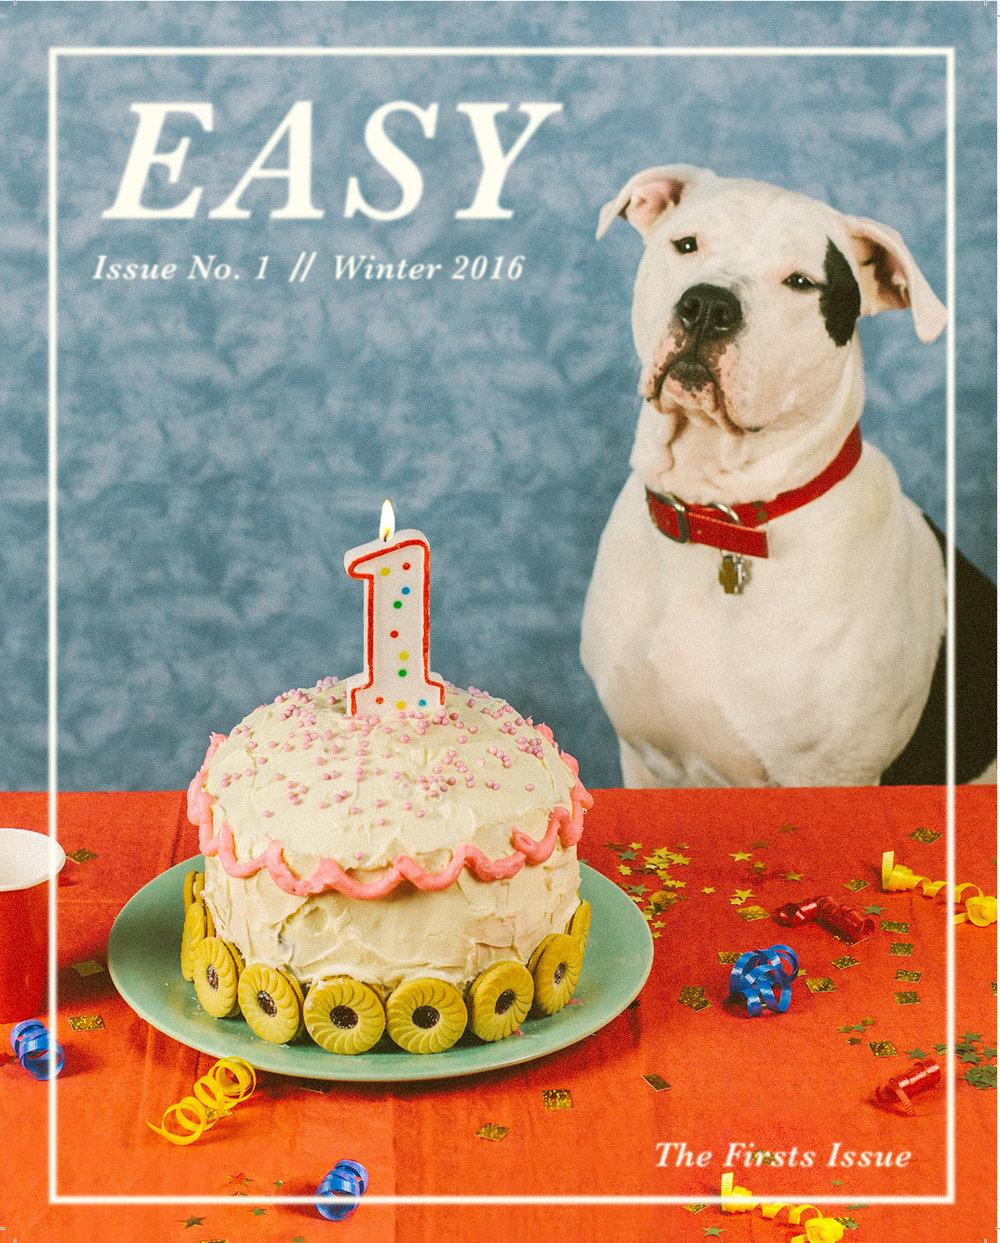 - Cover photo and designfor Easy Magazine